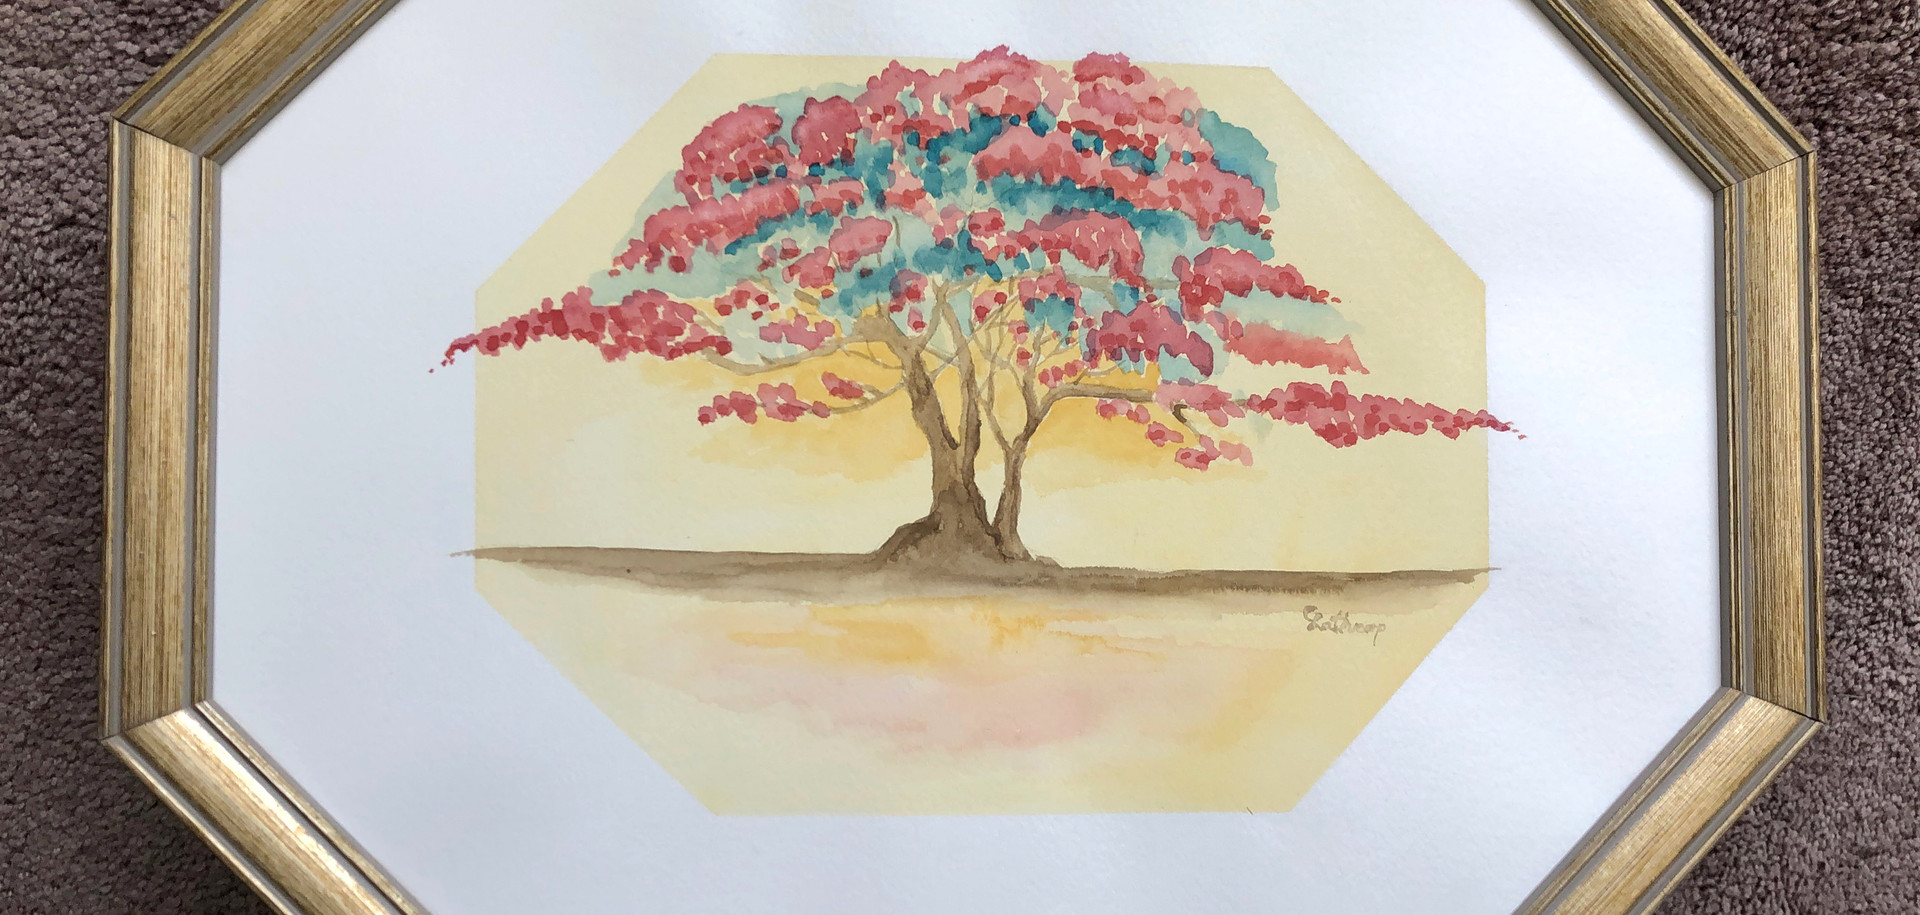 852 - 1 Framed tree pntg.jpg